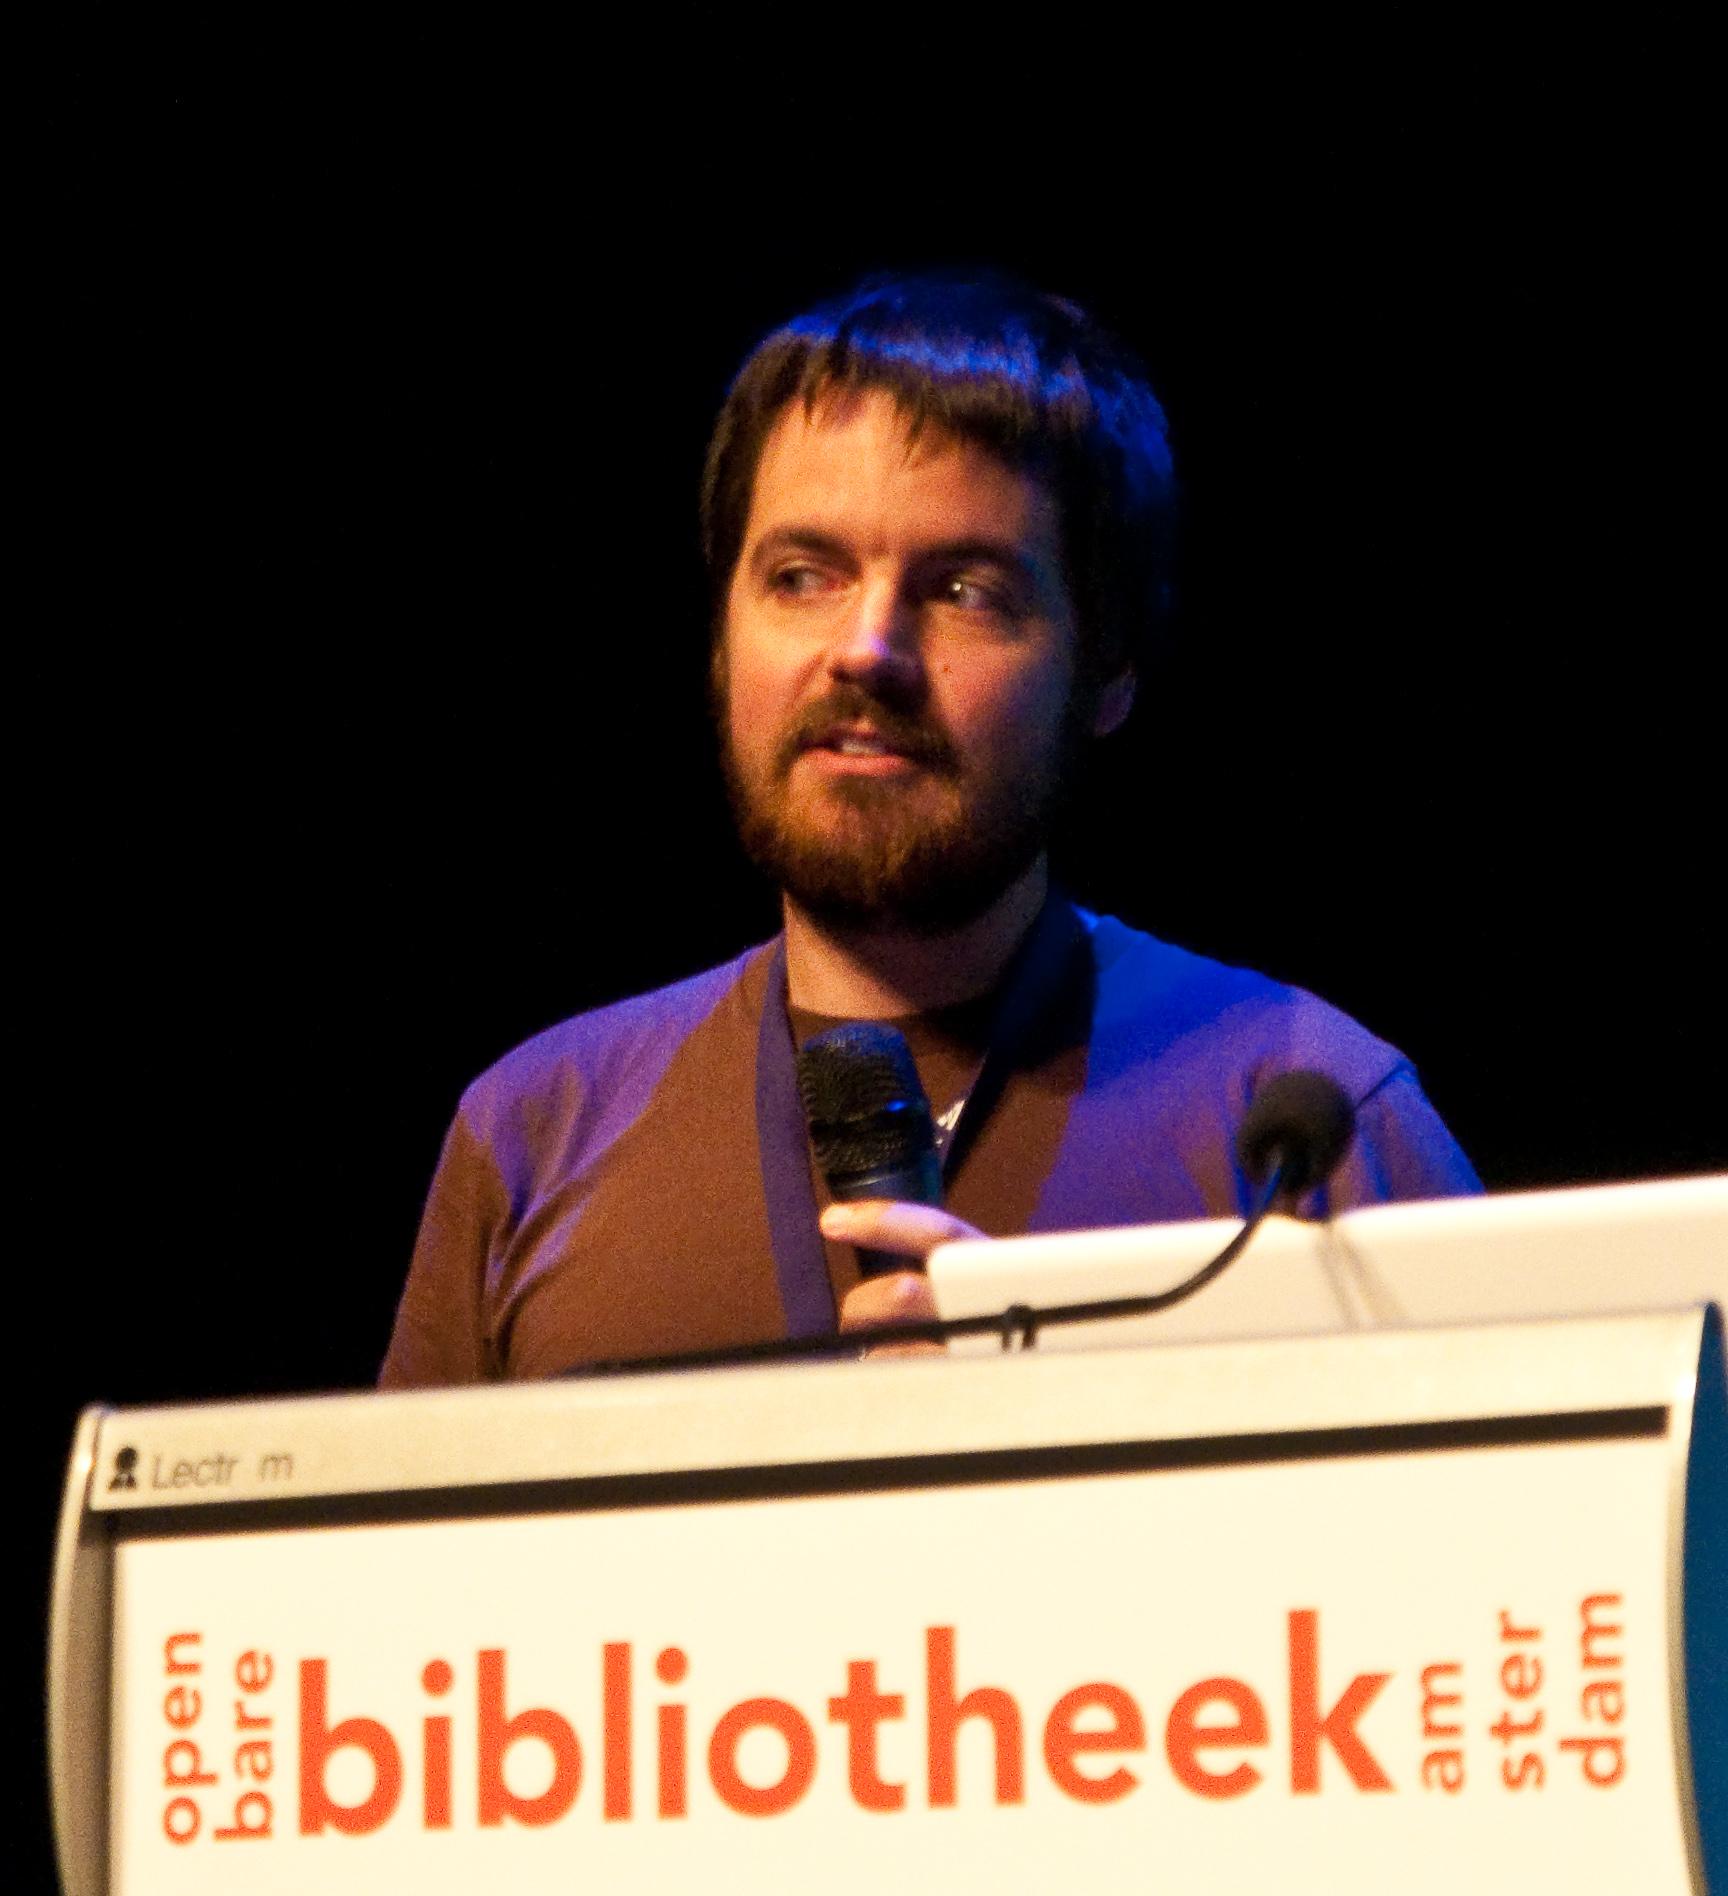 Nathaniel Tkacz at the Wikipedia Conference, 2010